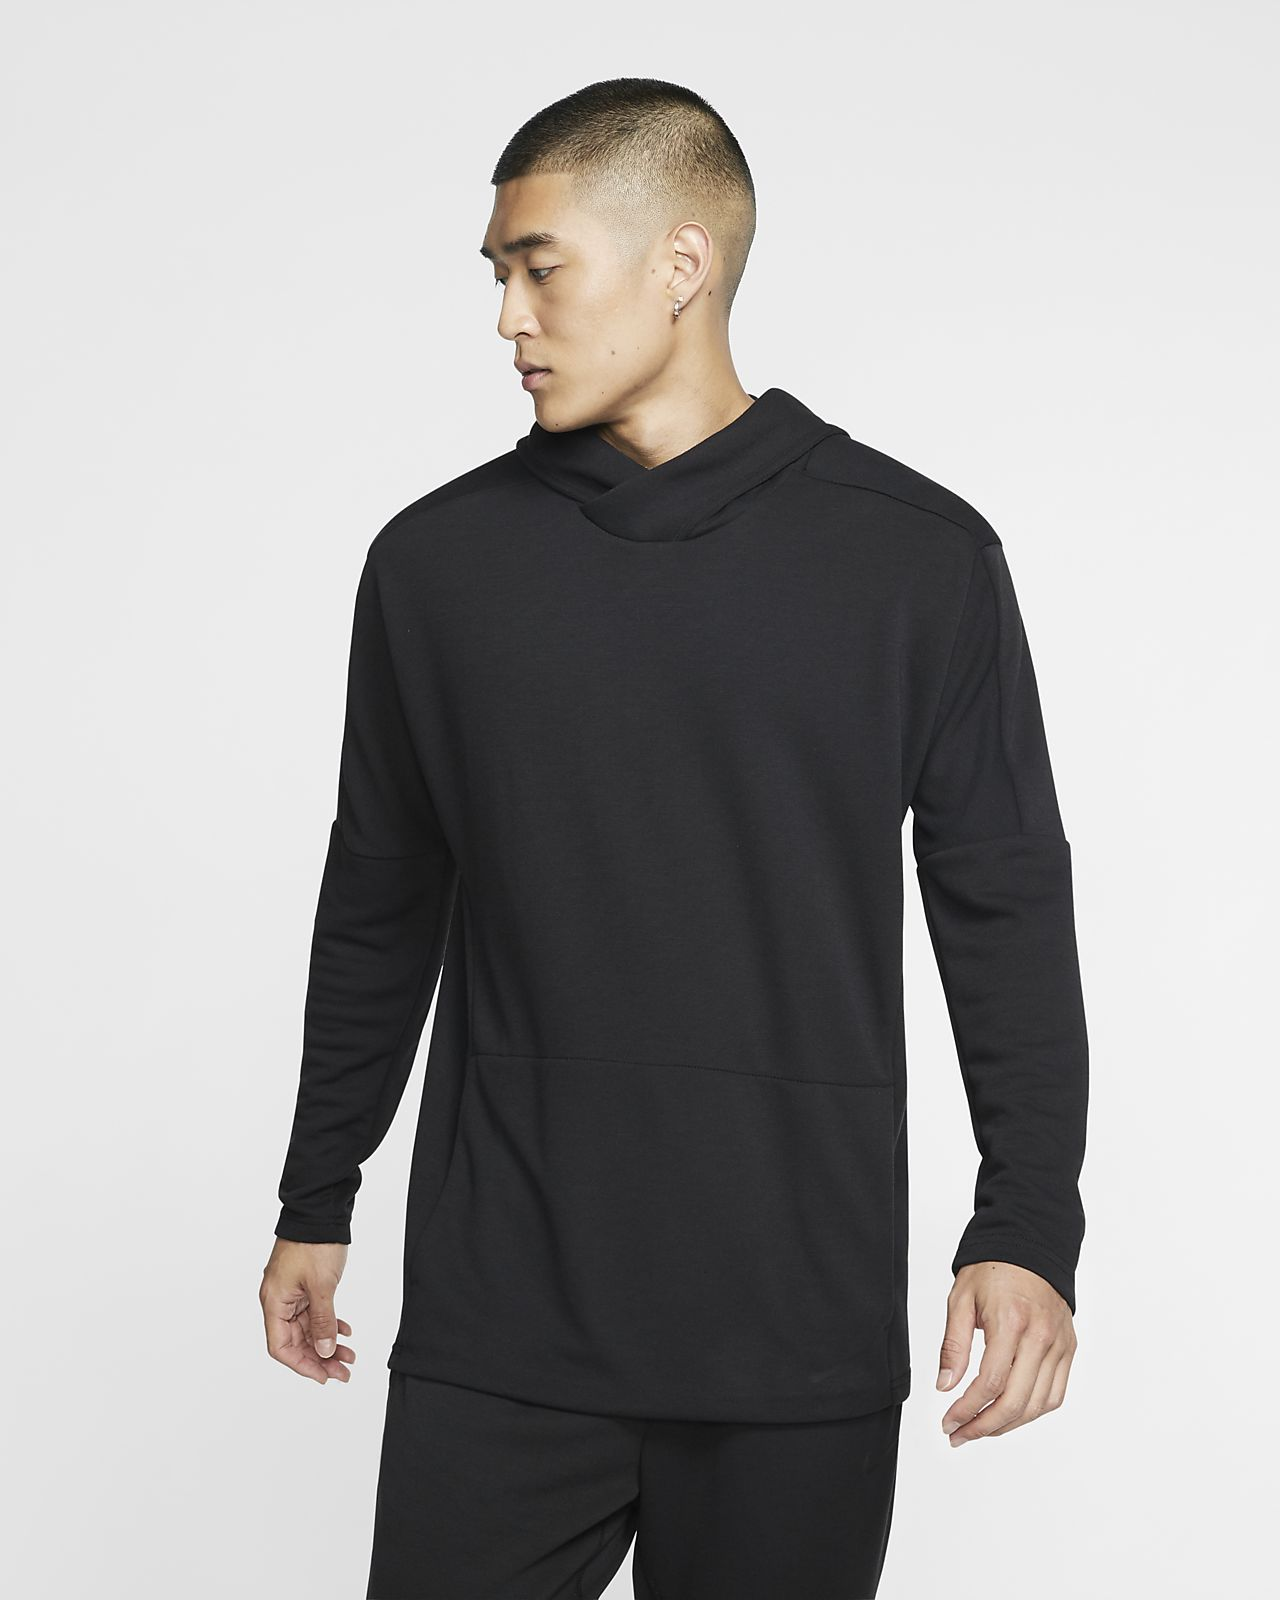 Nike Yoga Dri-FIT Erkek Kapüşonlu Sweatshirt'ü